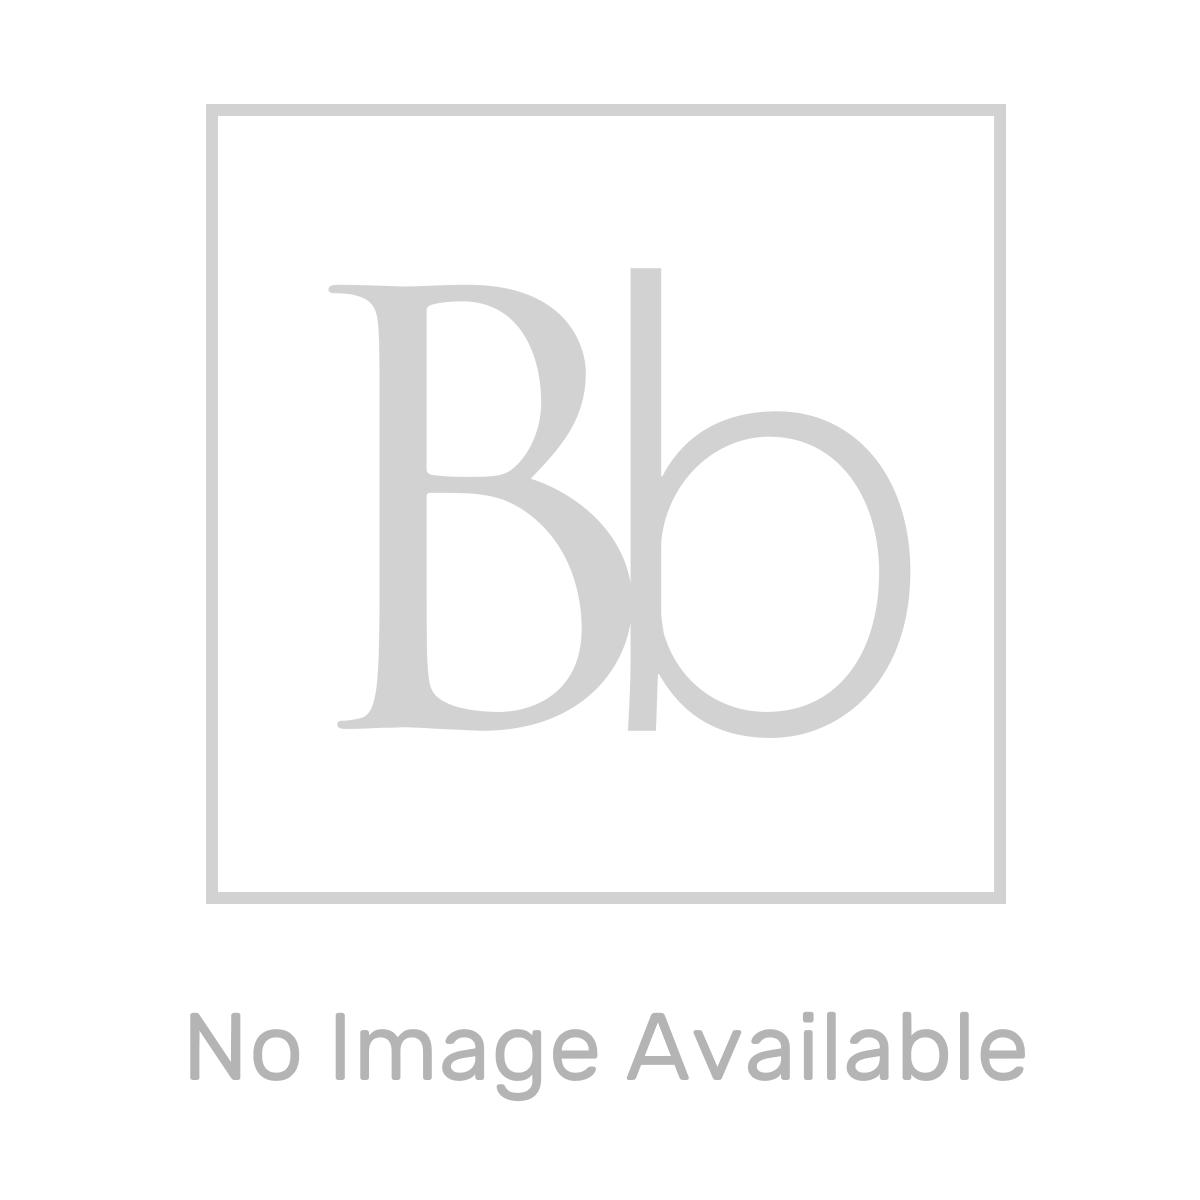 Nuie Athena Natural Oak 2 Door Floor Standing Vanity Unit with 50mm Profile Basin 600mm Line Drawing